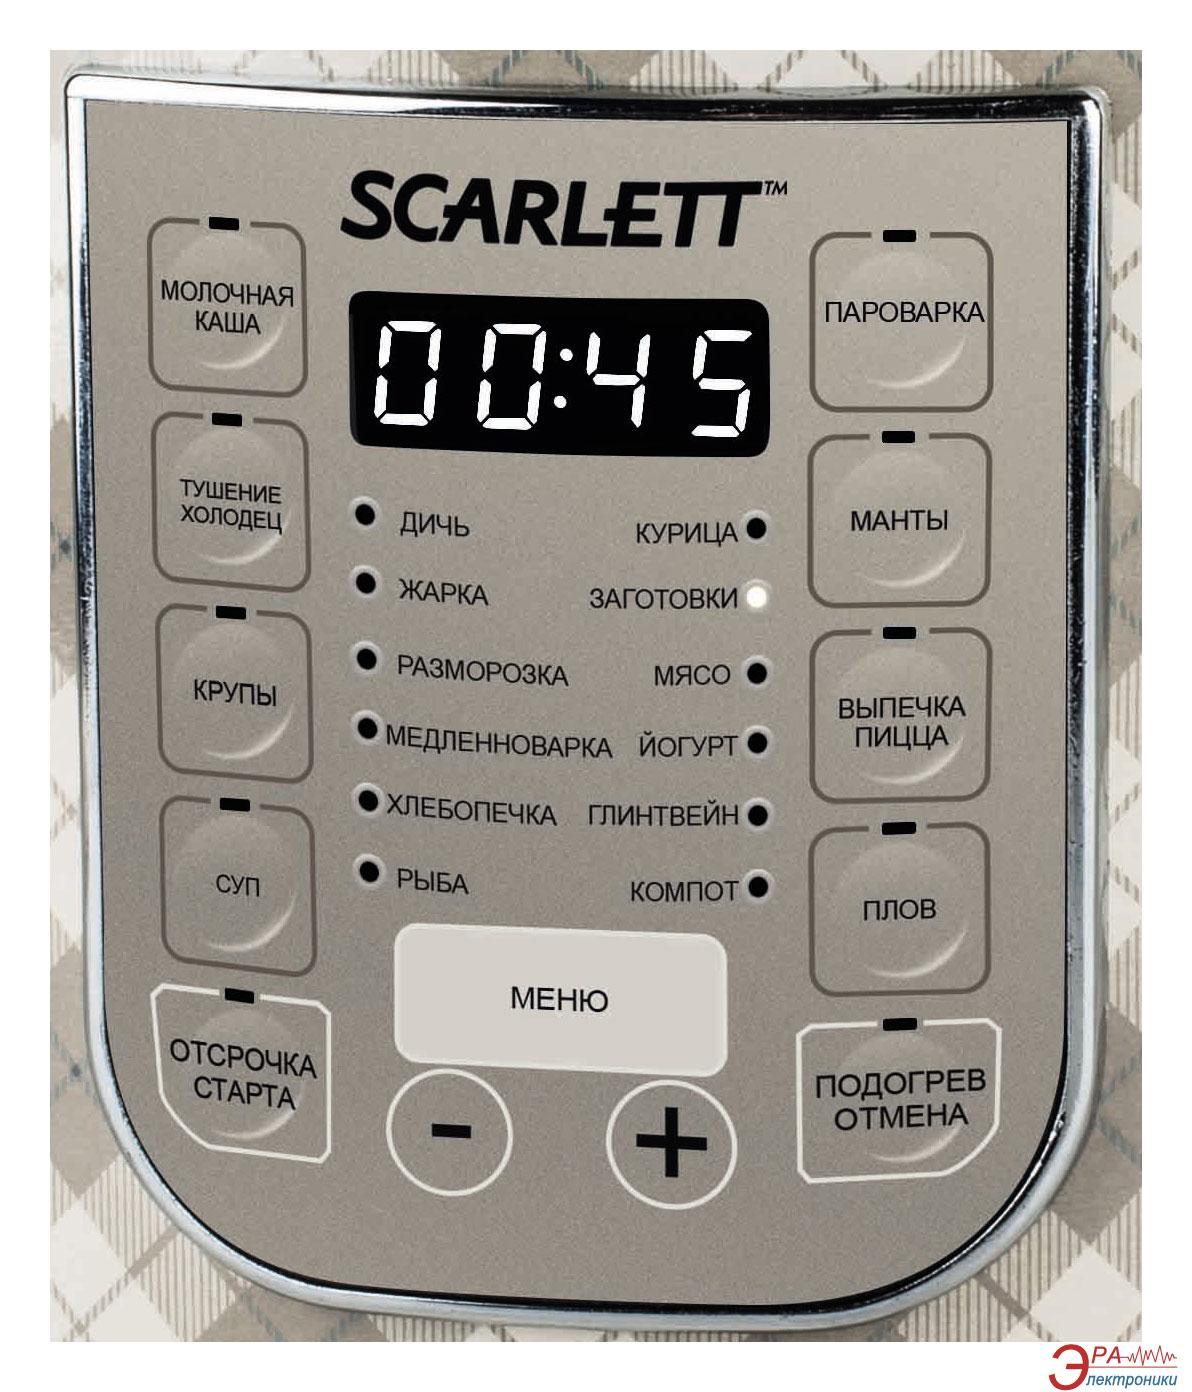 Рецепты для мультиварки scarlett sc 410 рецепты